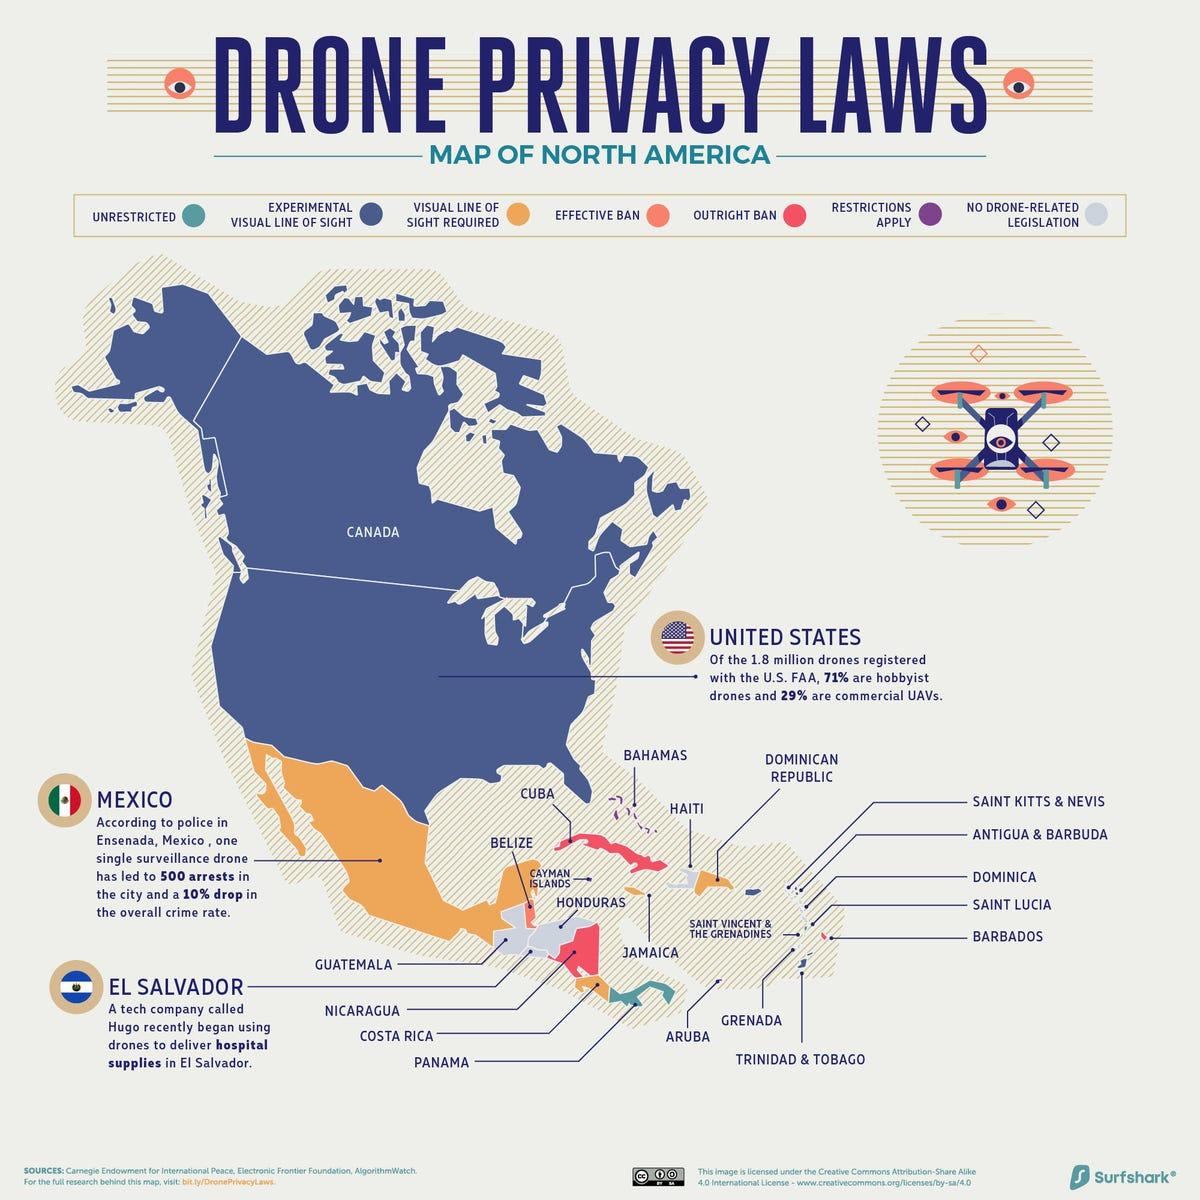 drone-privacy-laws-around-northamerica.jpg